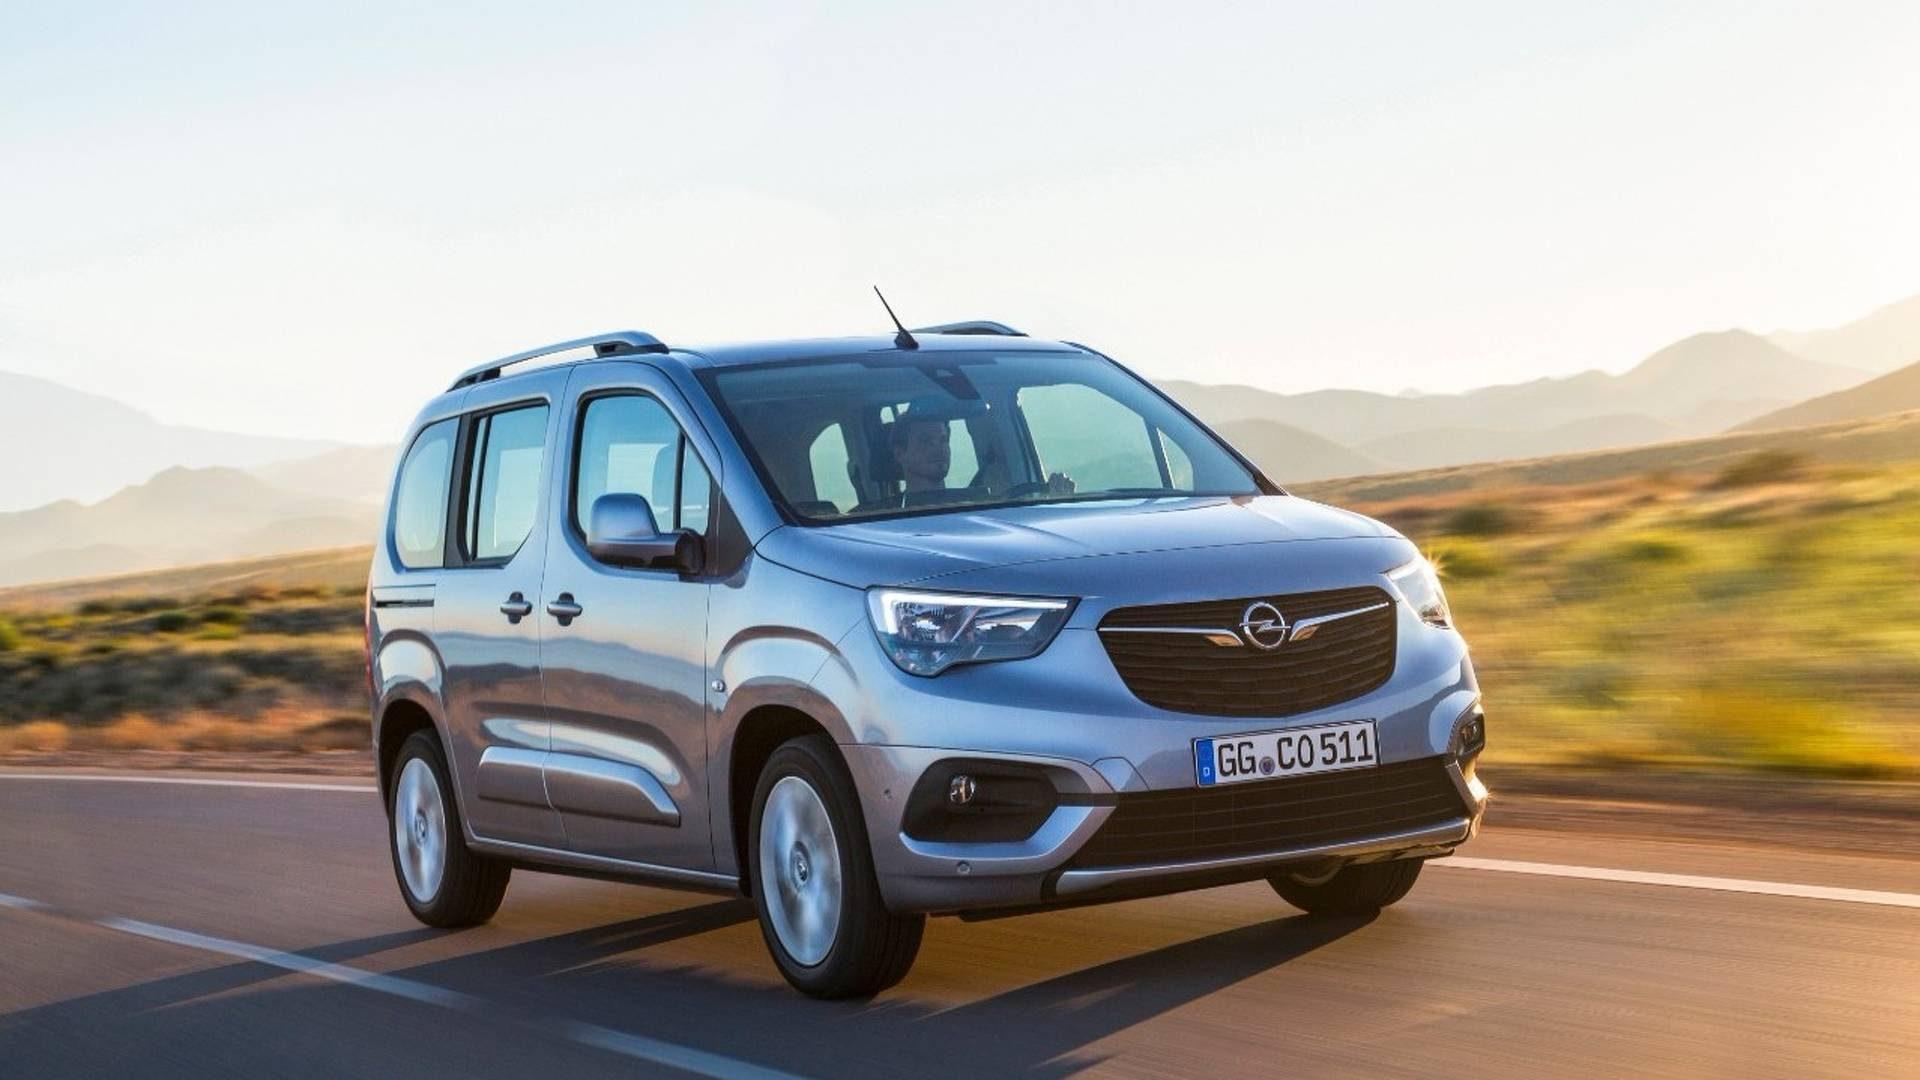 Opel Combo Life Ultimate 1,5 Dizel AT-8 İncelemesi